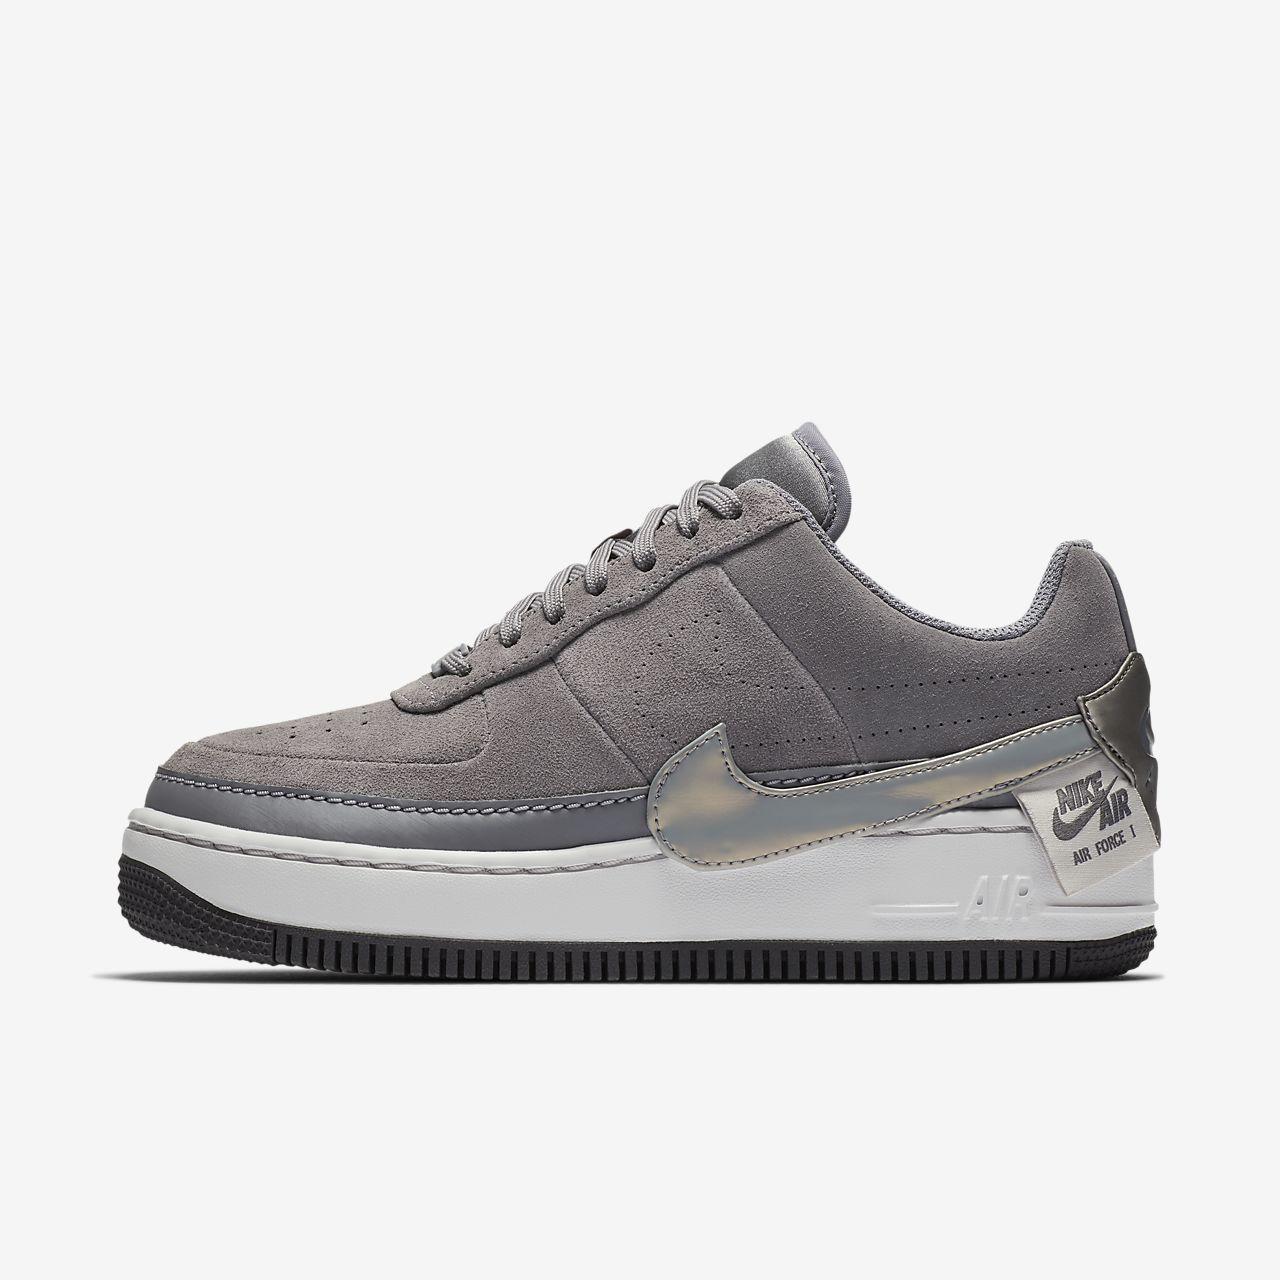 best service dedd2 275ef discount 2011201520172013201620142012 90 herre nike 21dd2 37fa5  where to  buy nike air force 1 jester metallic sko til dame 59998 b2e86